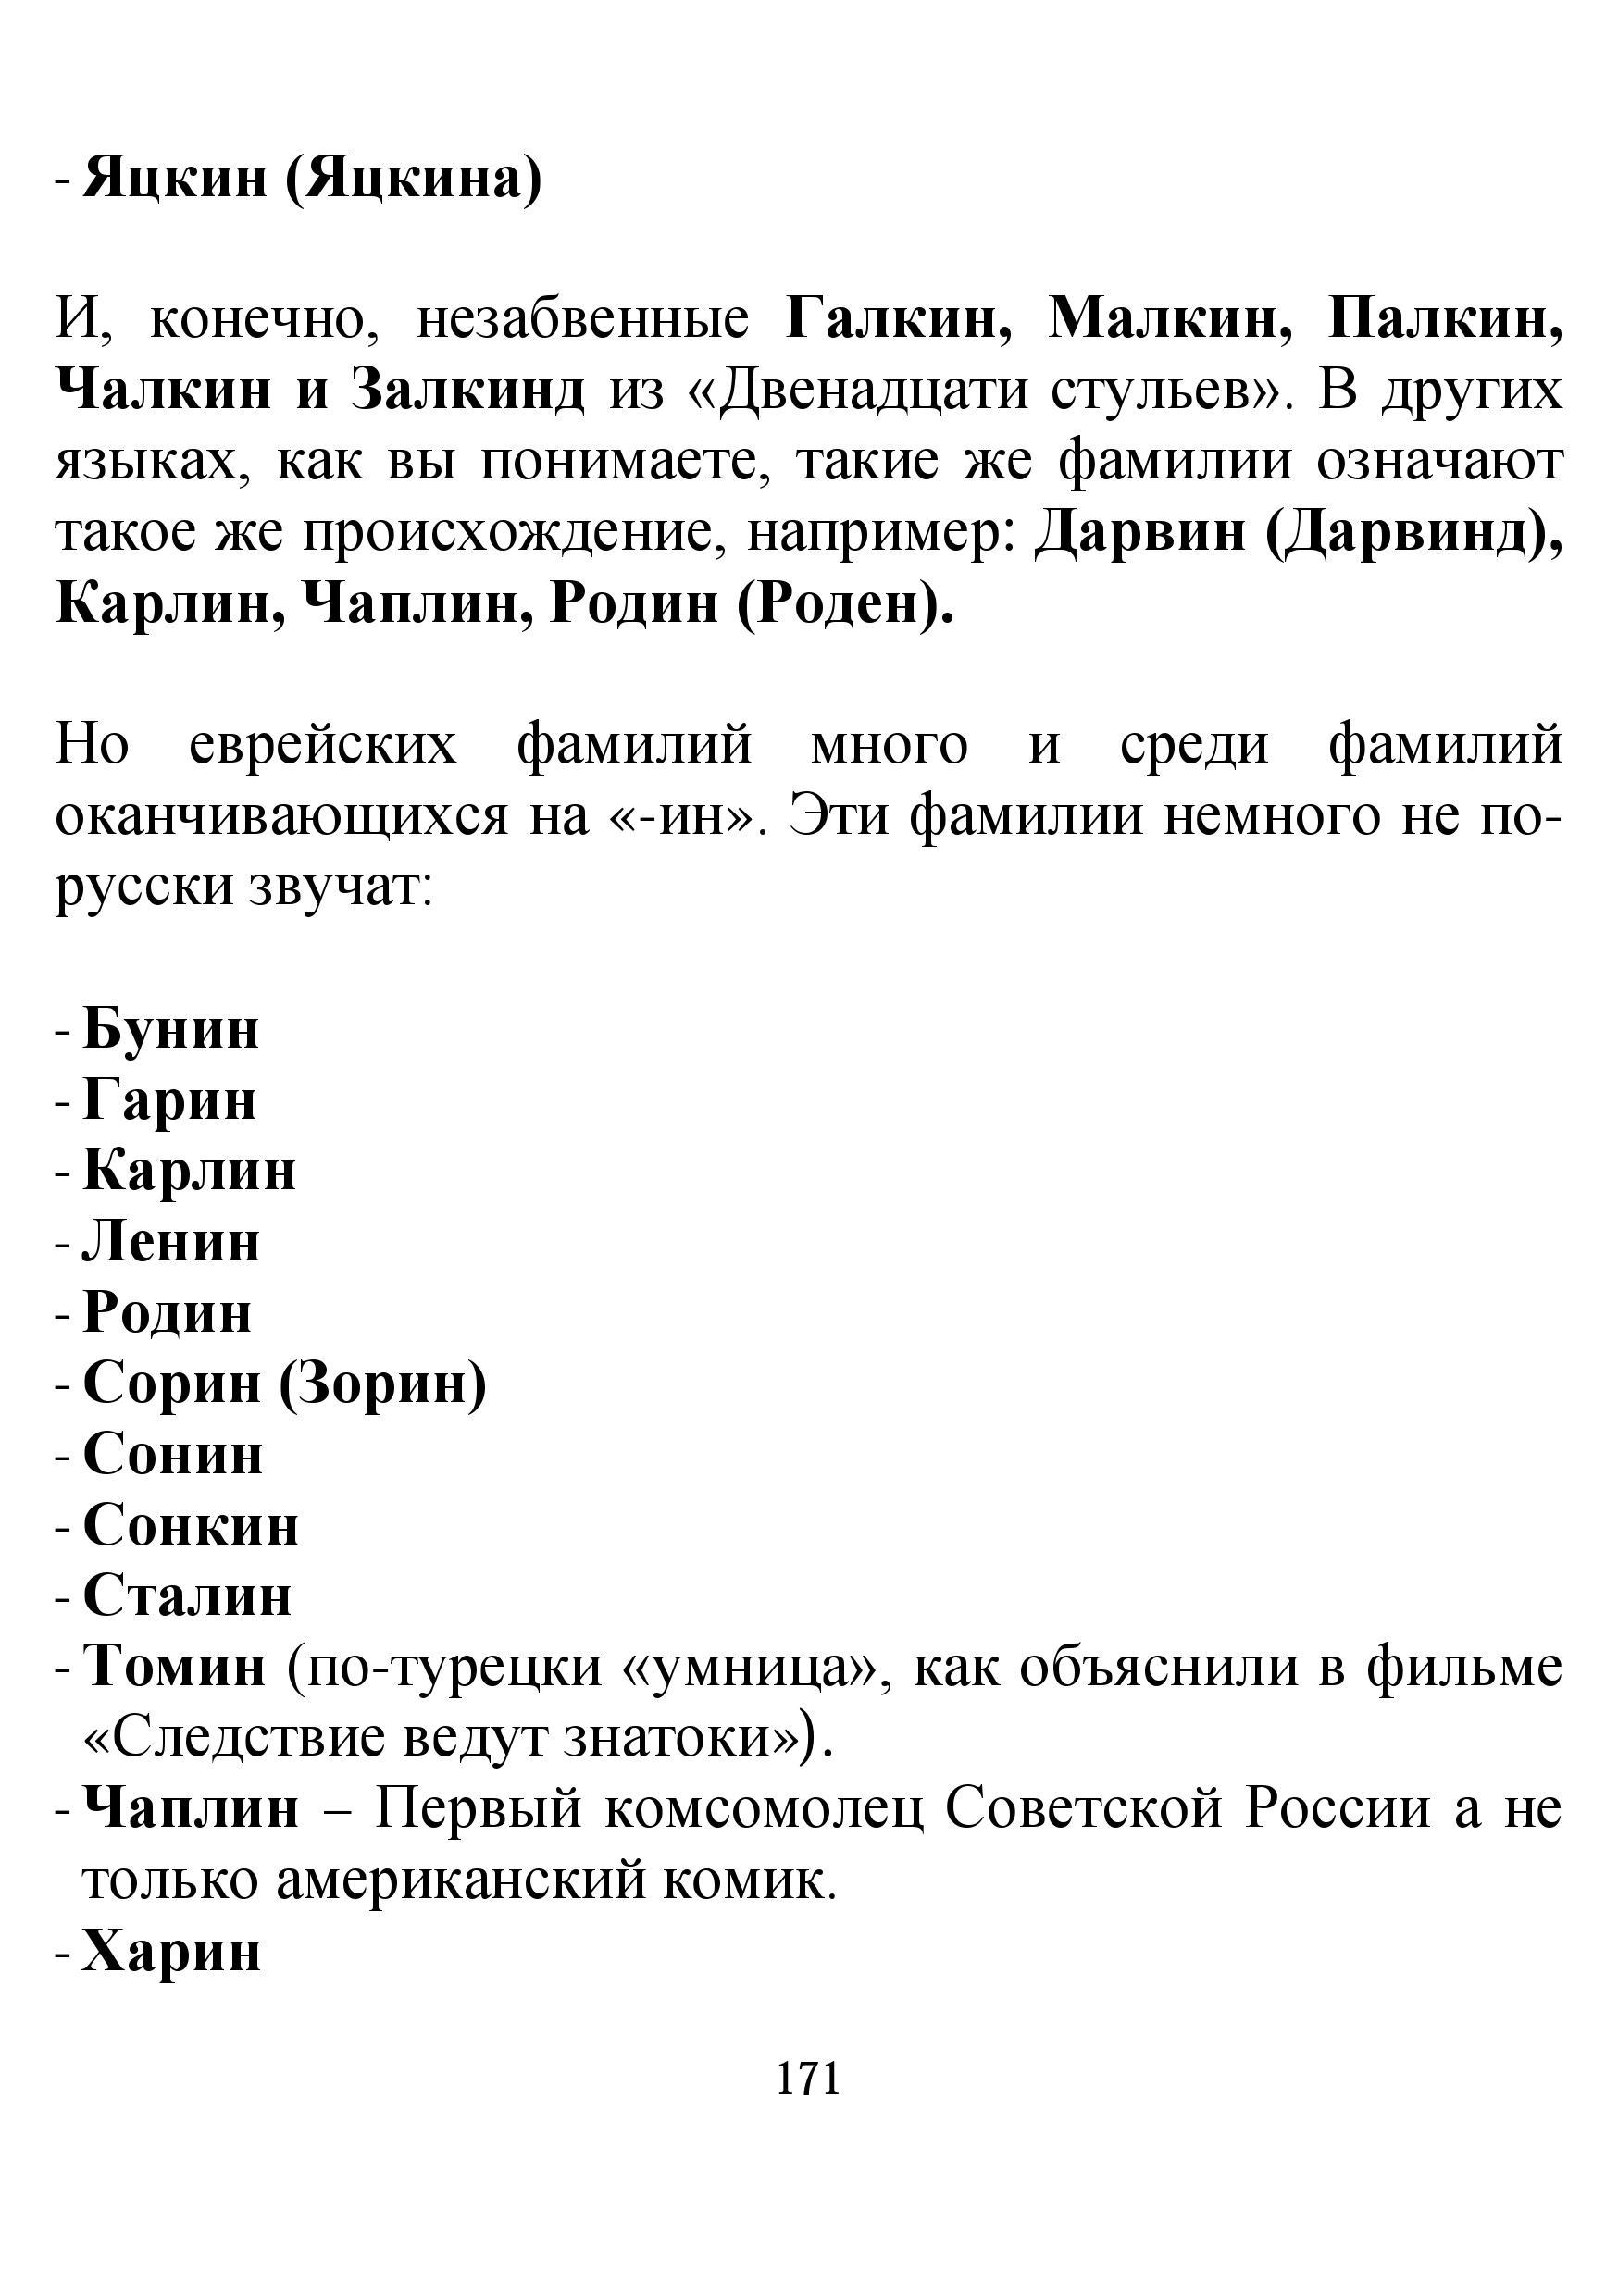 http://s5.uploads.ru/GhBol.jpg